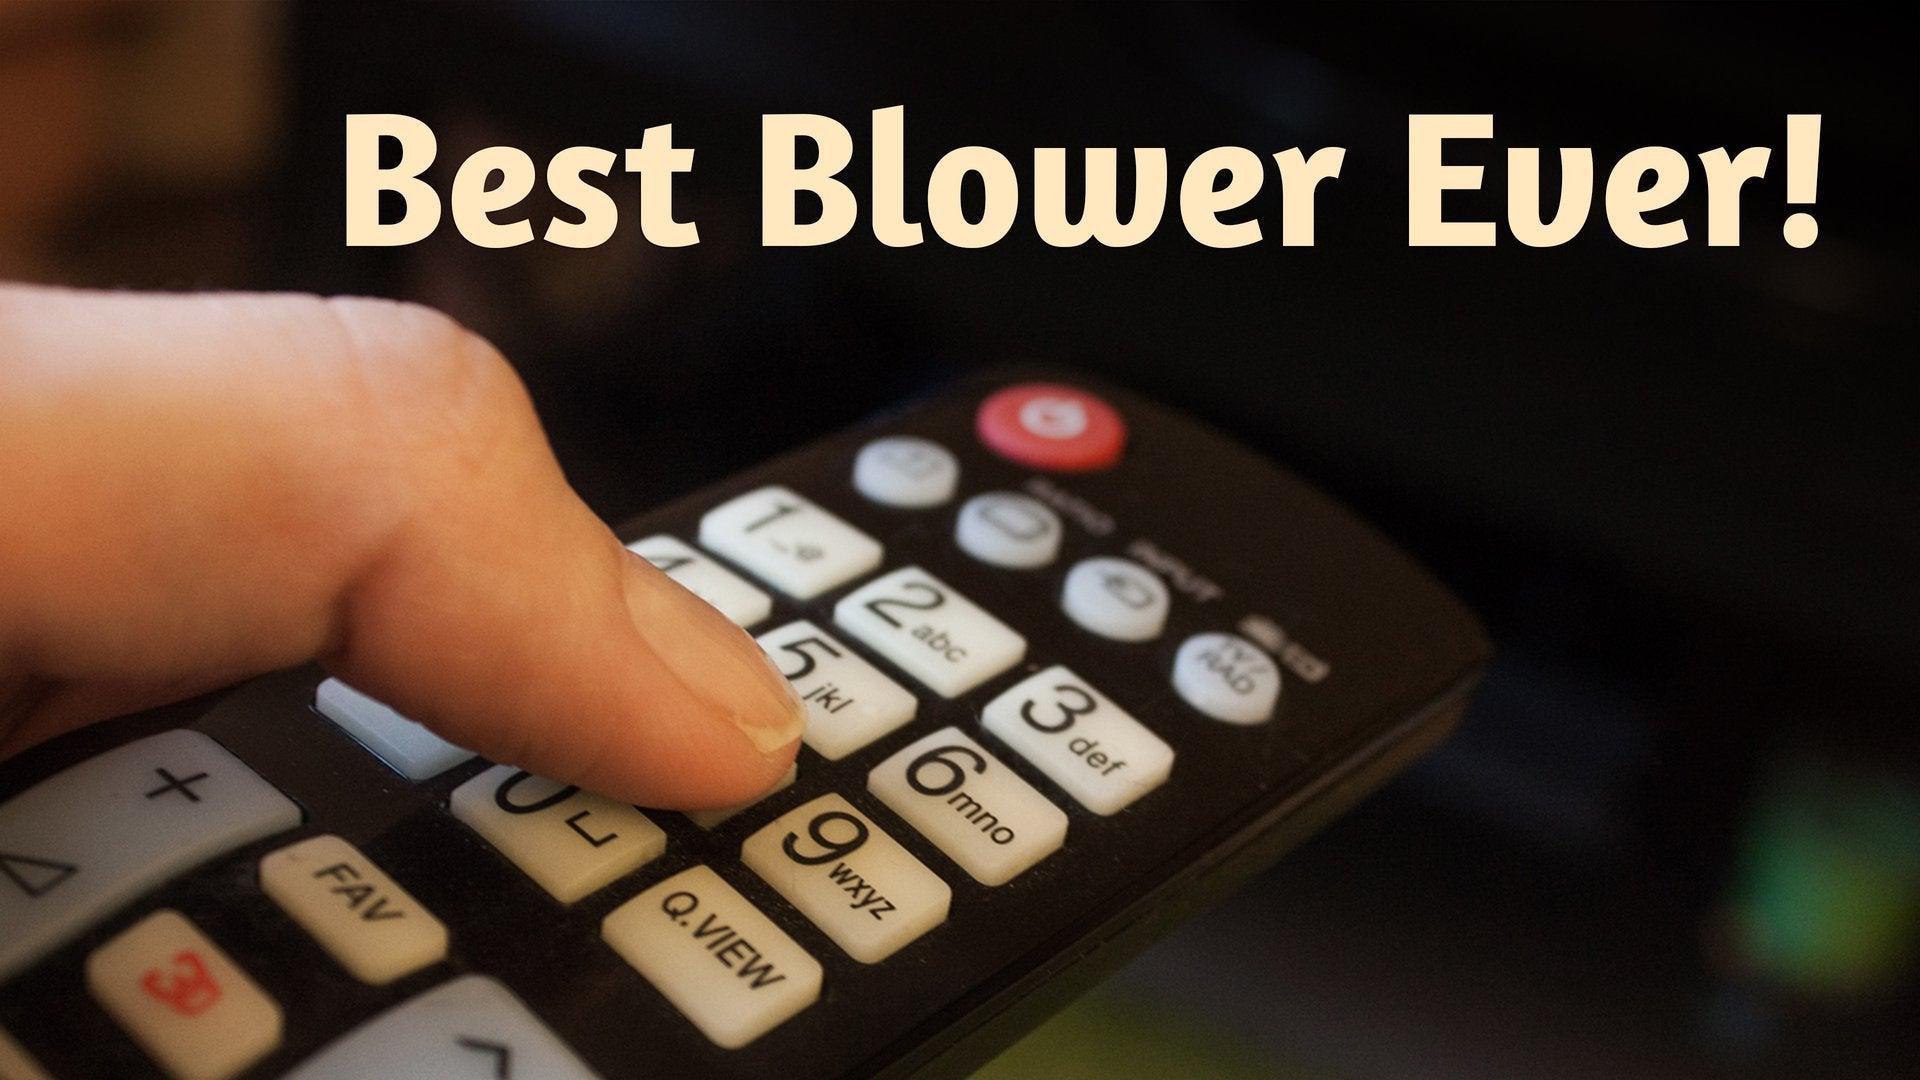 Best Blower Ever!